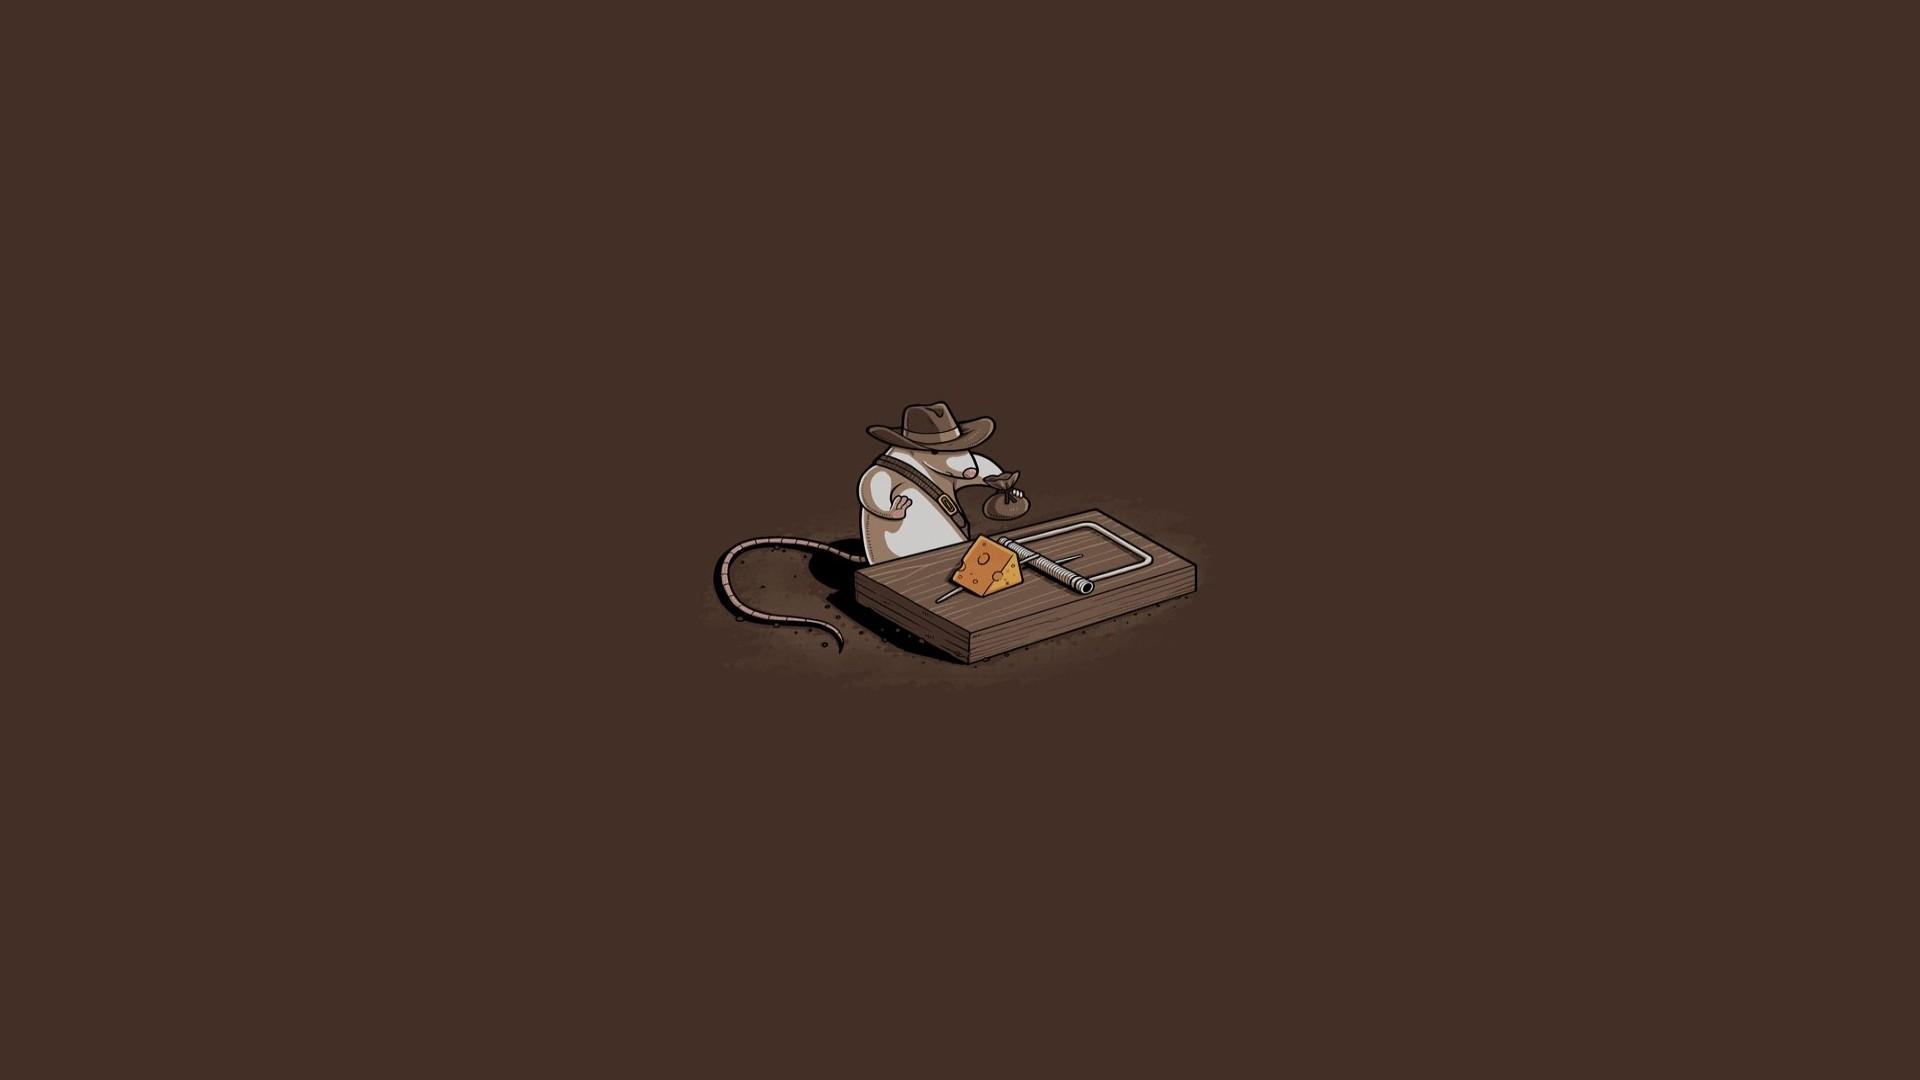 Wallpaper : illustration, mice, minimalism, weapon, logo ...